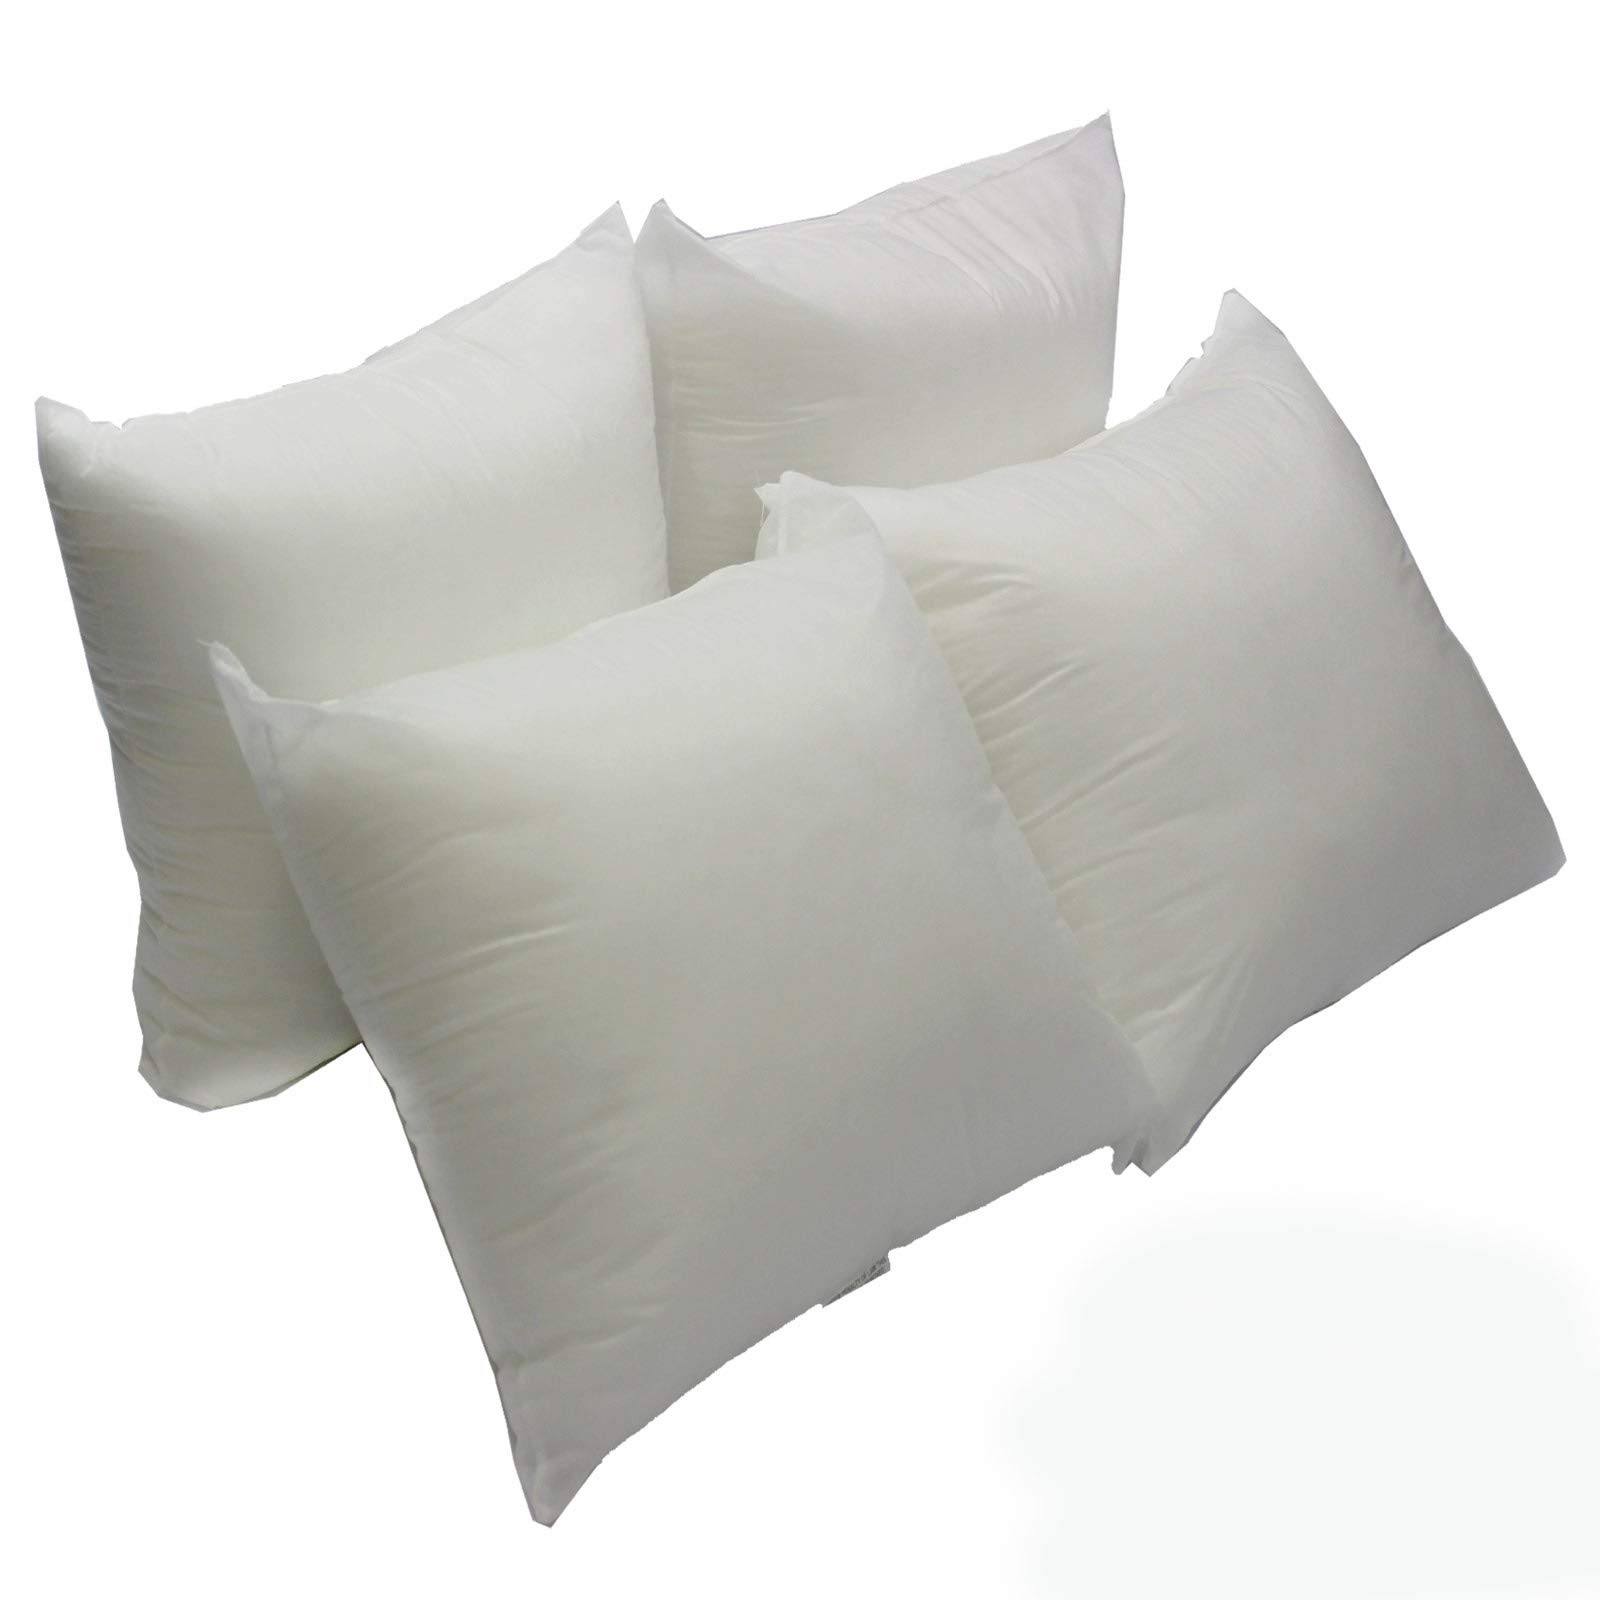 Mybecca 4 Pack Premium Hypoallergenic Stuffer Pillow Insert Sham Square Form Polyester, 16'' L X 16'' W, Standard/White by Mybecca